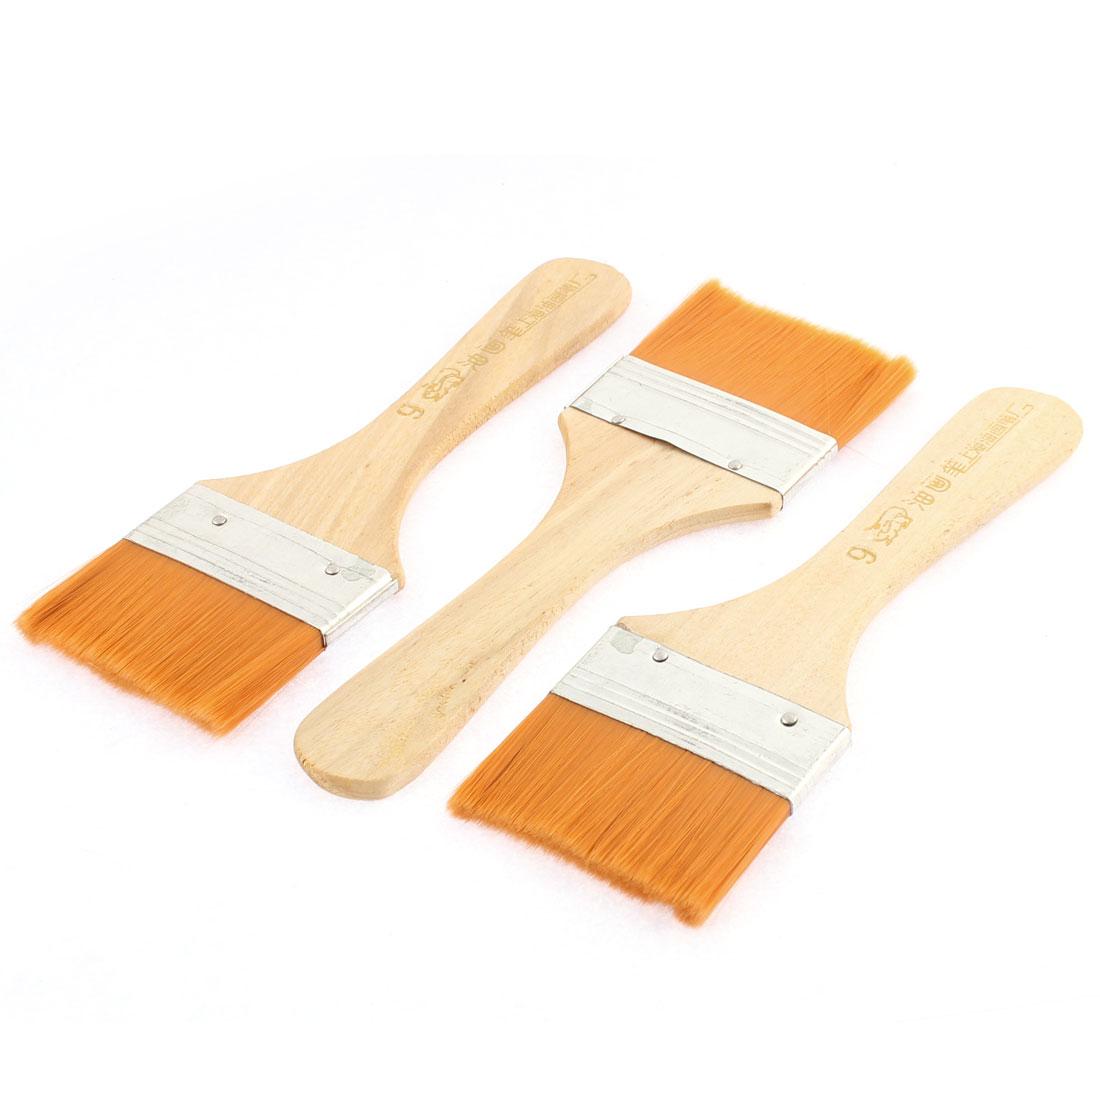 3 Pcs Wooden Handle 55mm x 30mm Bristles Head Oil Paint Painting Brushes